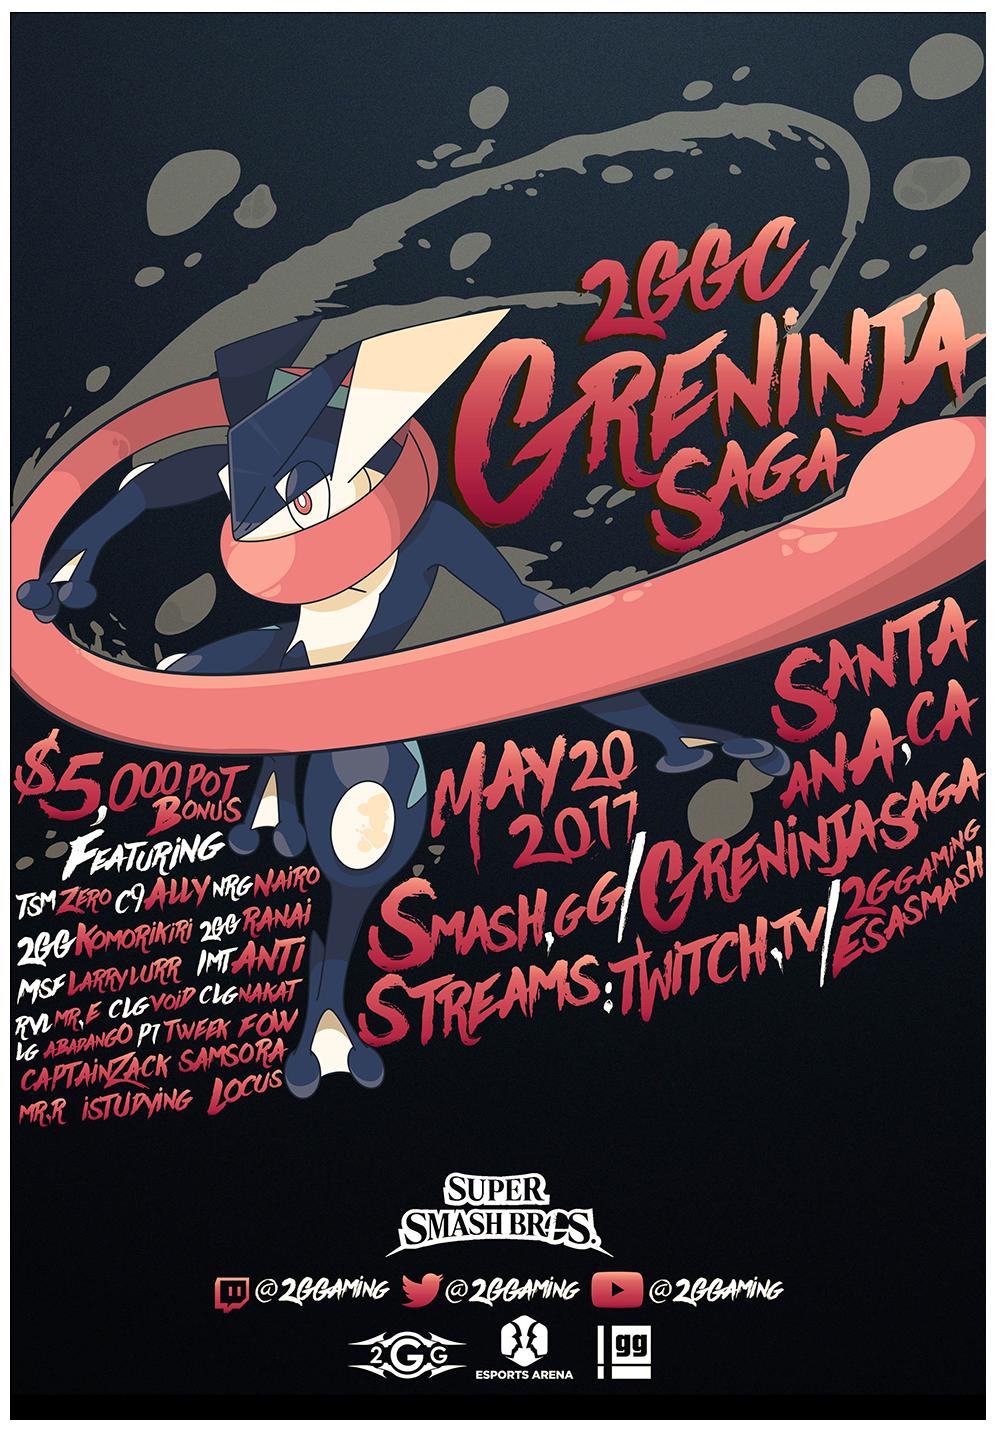 greninha saga poster idea